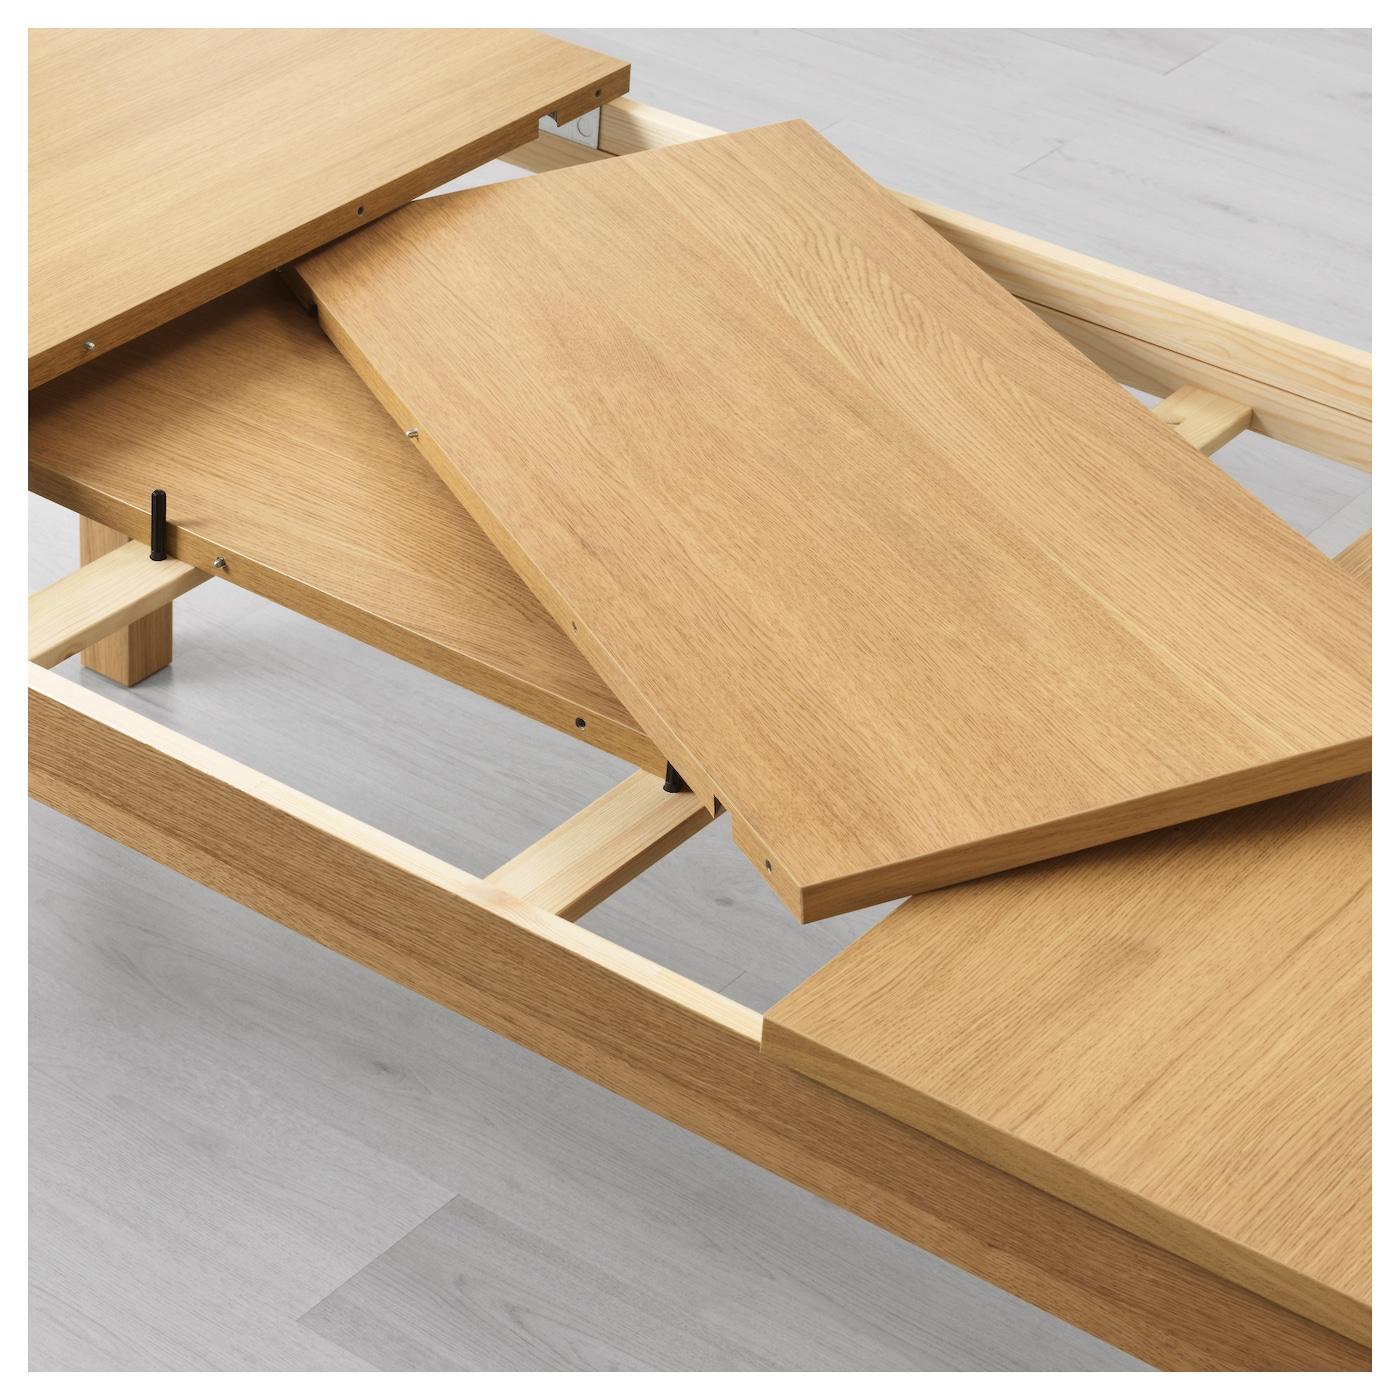 bjursta extendable table oak veneer x cm  ikea - ikea bjursta extendable table  extension leaves included